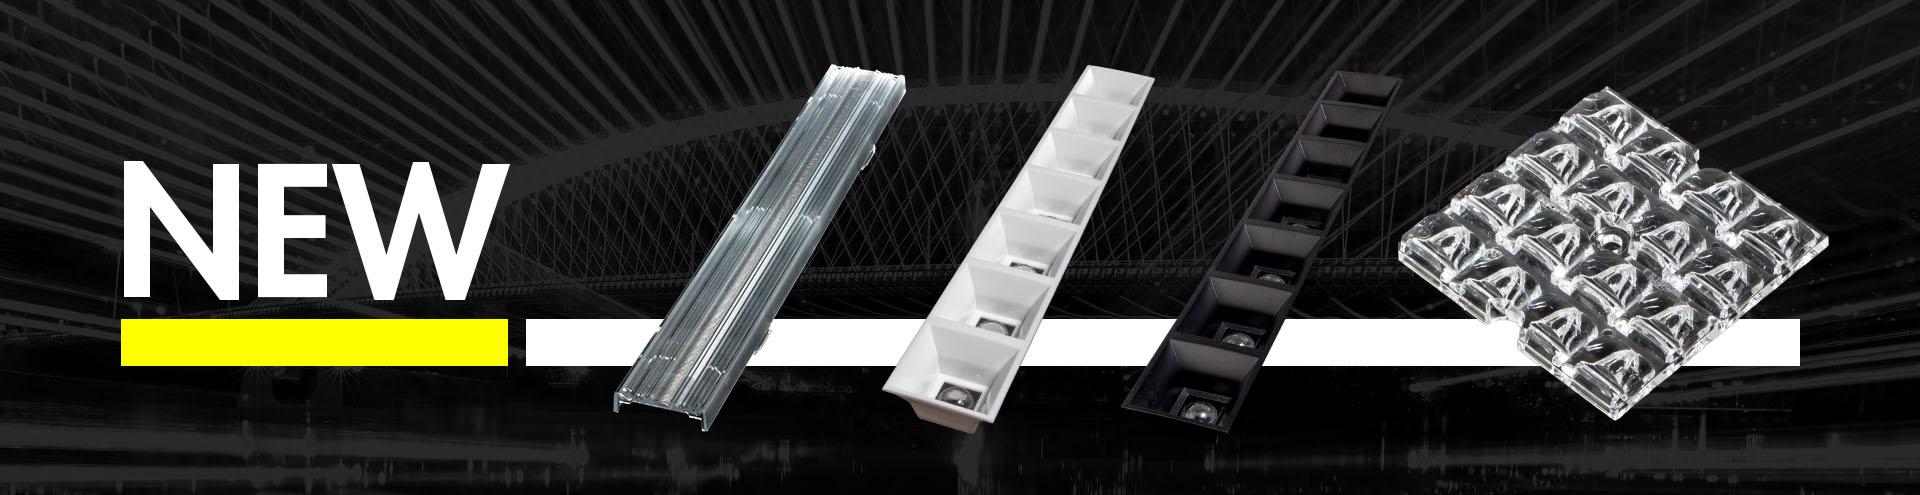 New Products 2019-06-13 - LEDiL